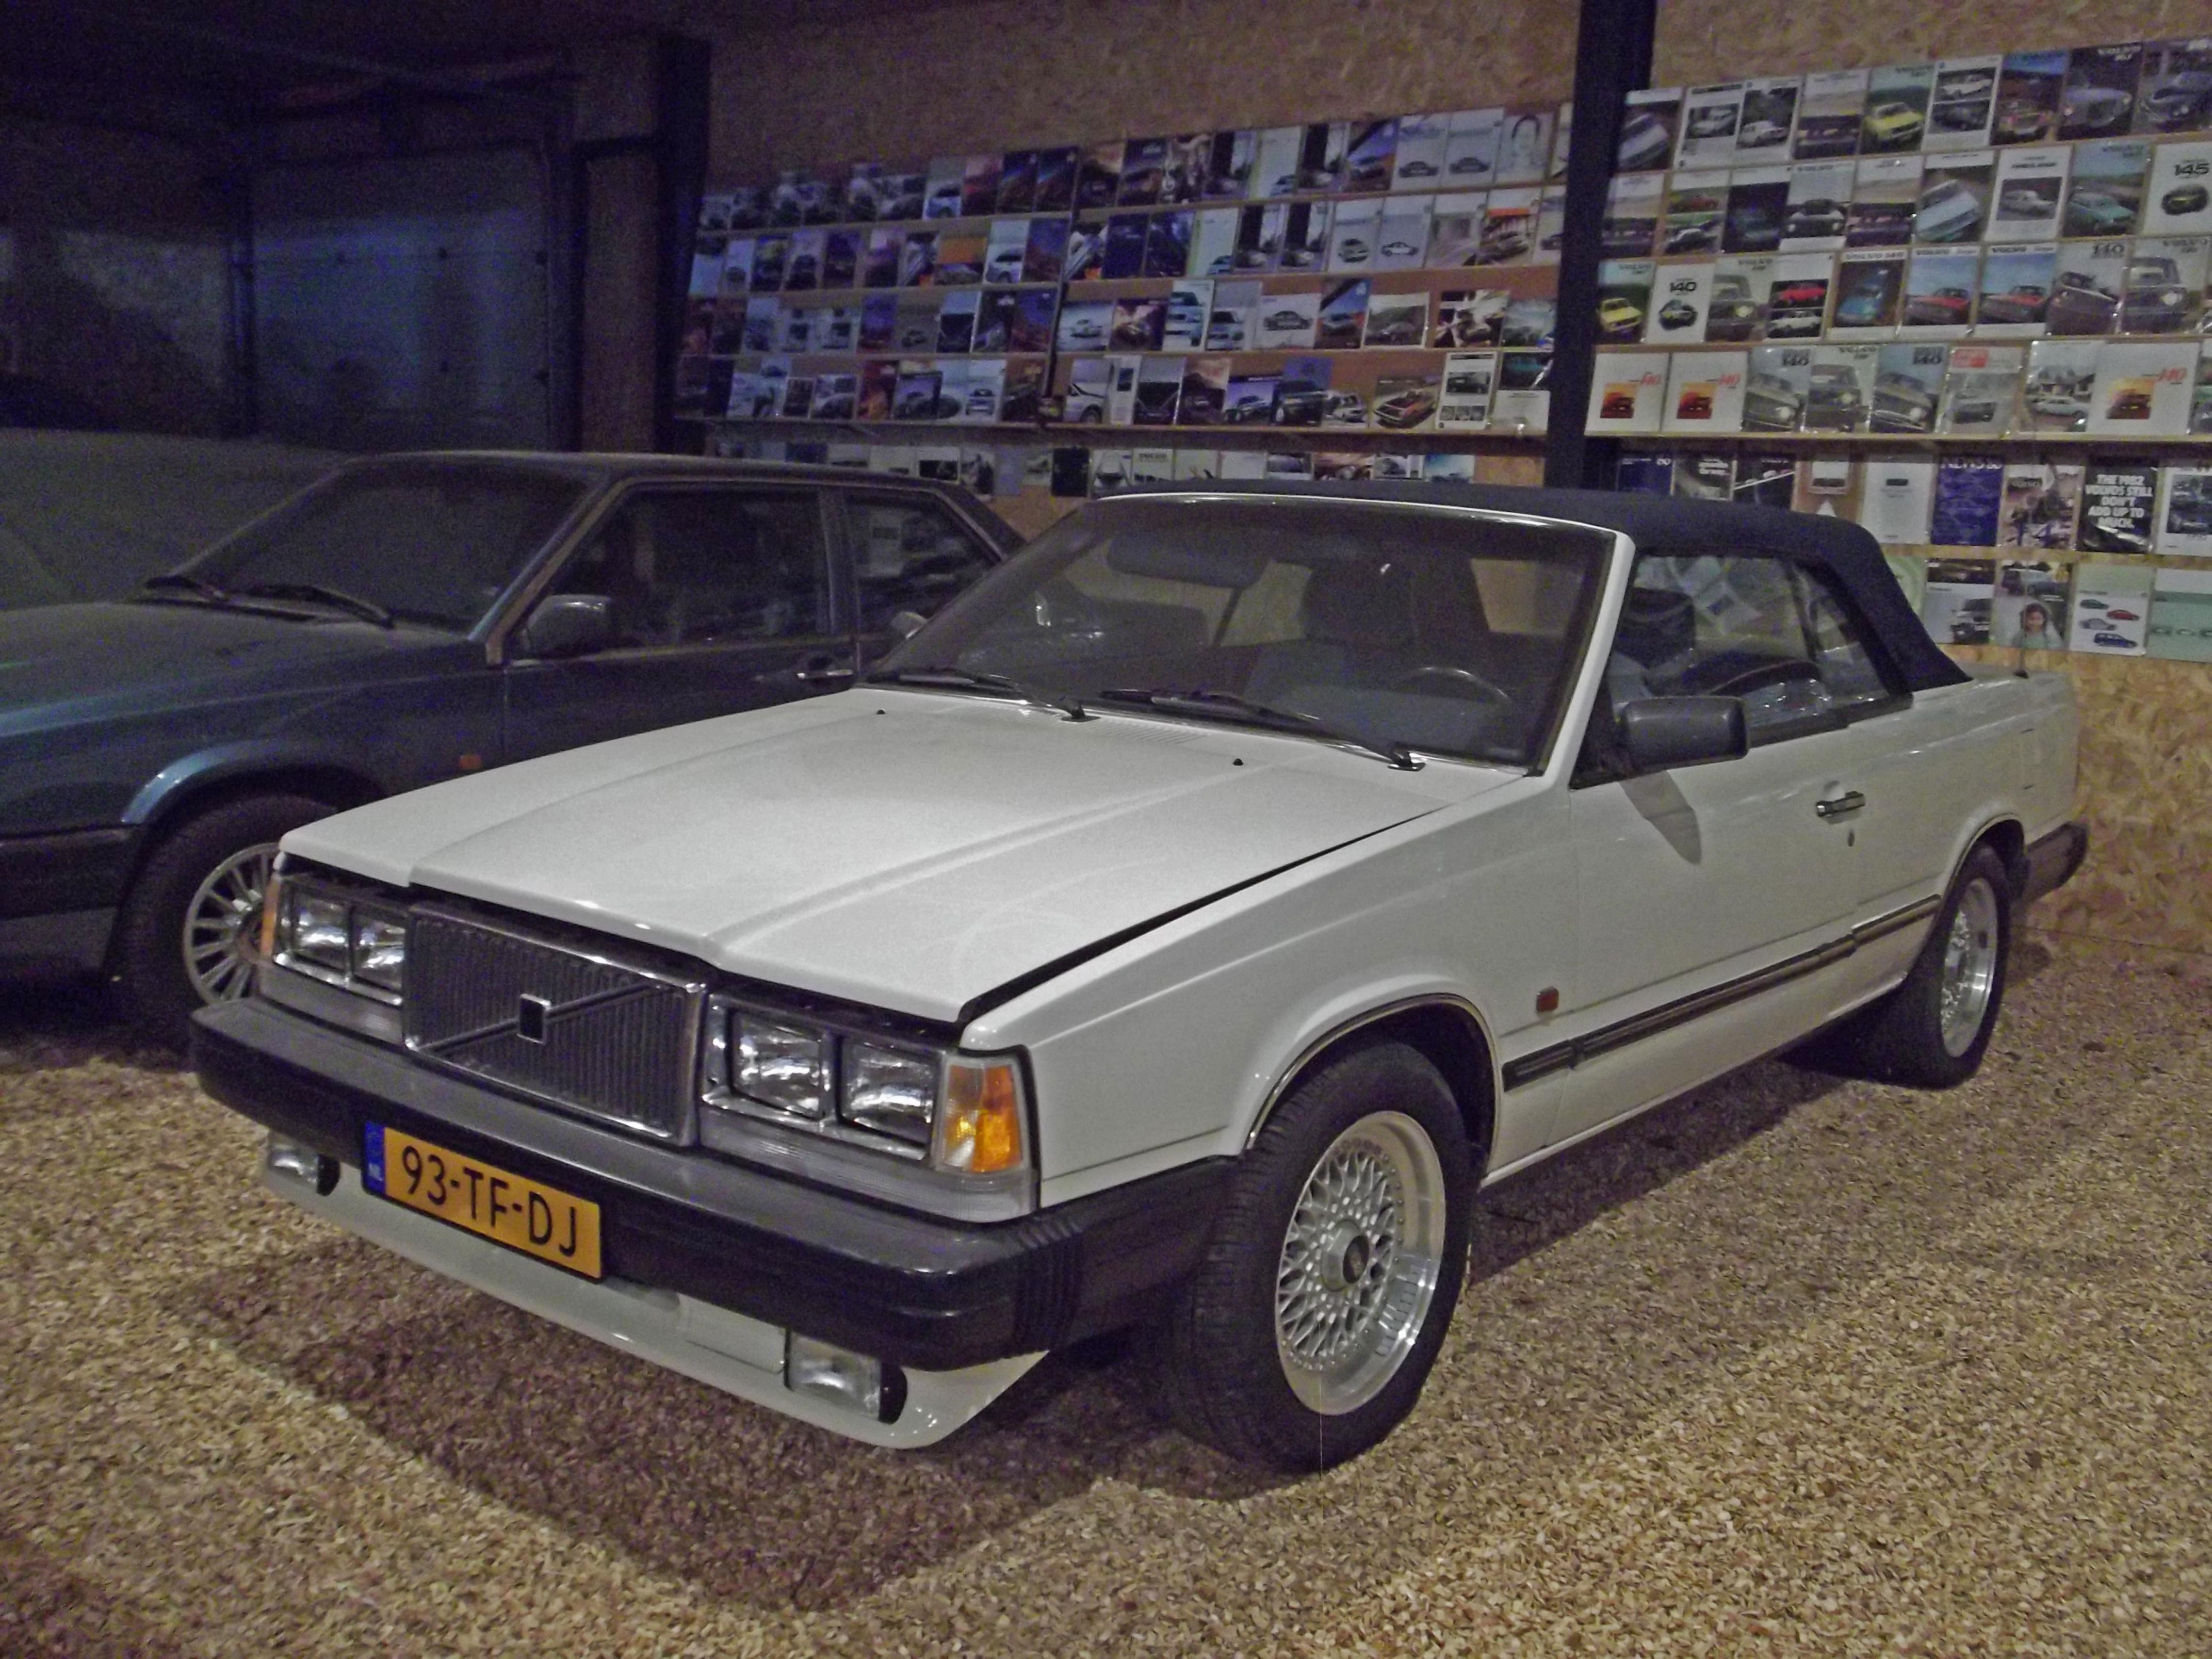 File:Volvo 780 Convertible (14487895265).jpg - Wikimedia Commons